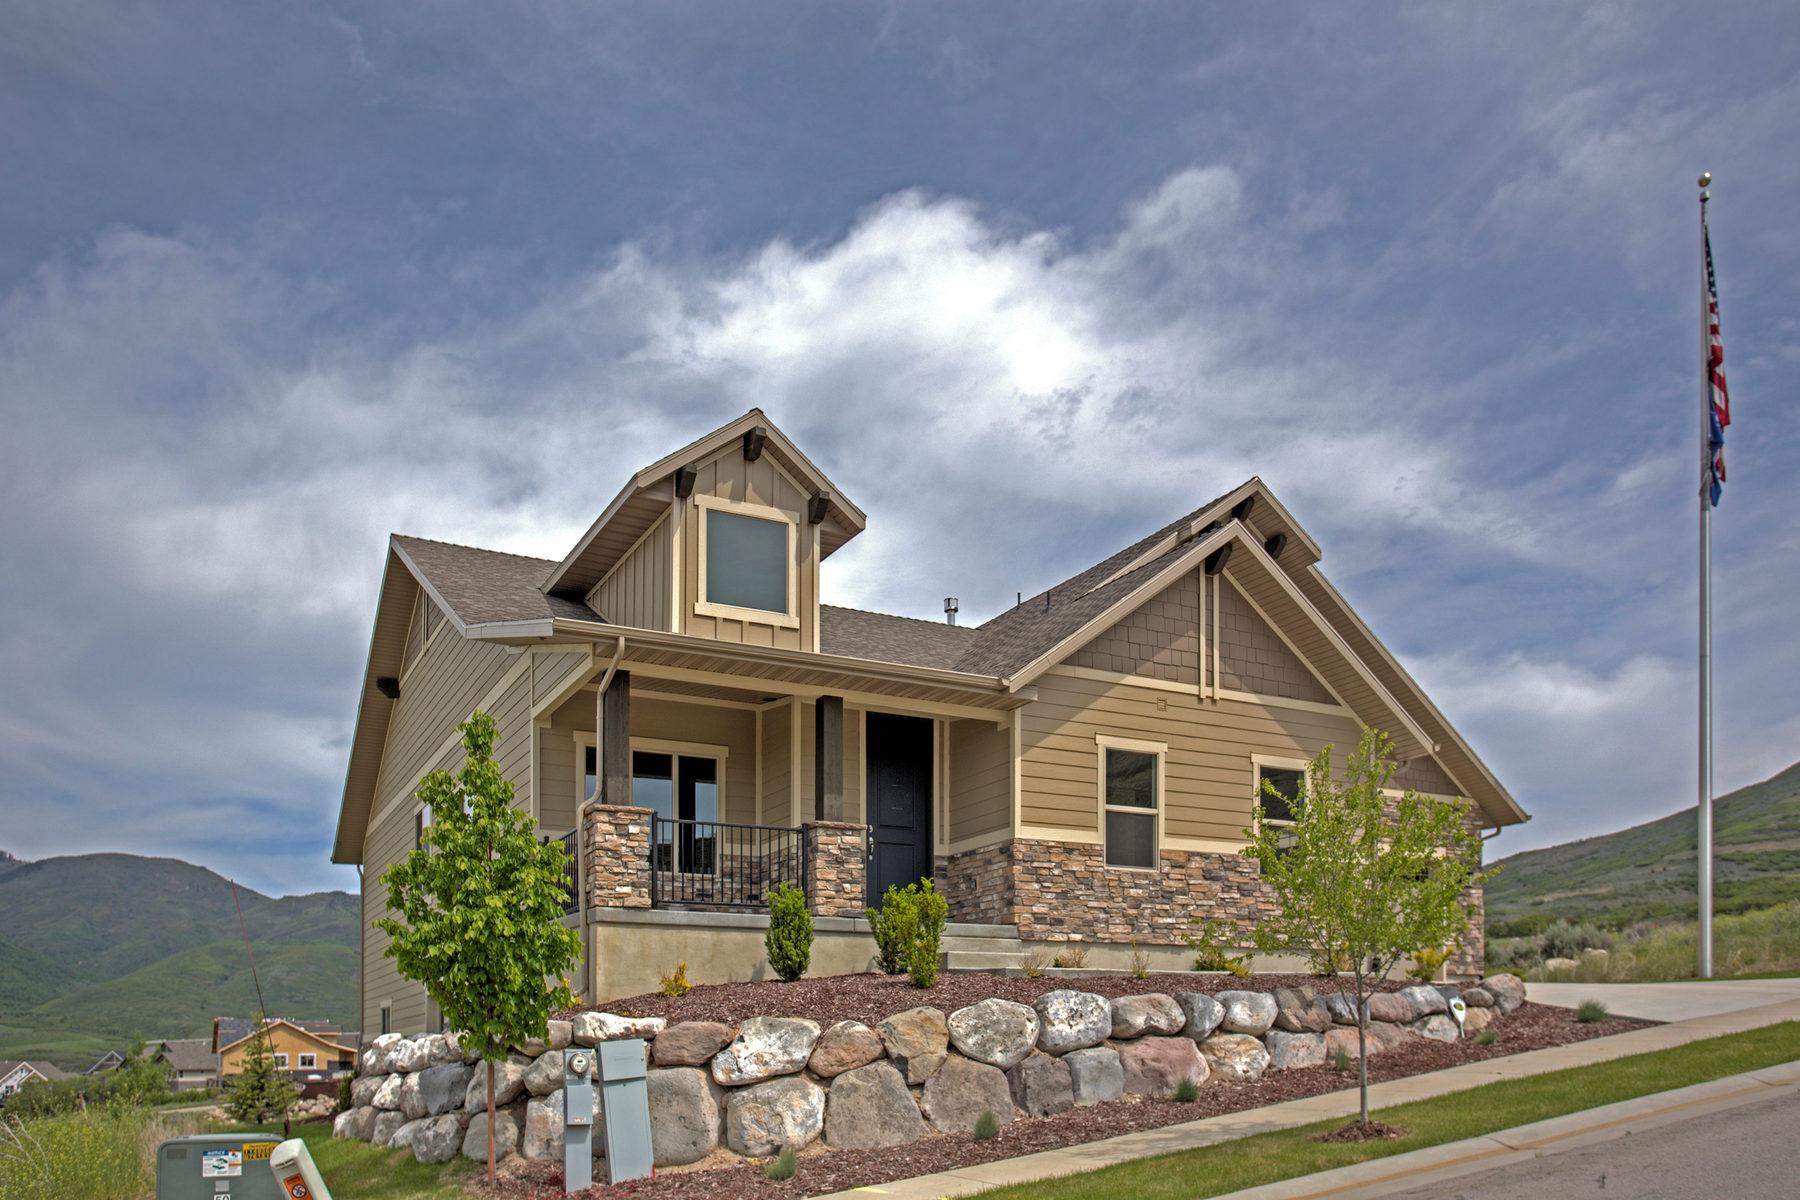 Villa per Vendita alle ore Model Home with Views of Timpanogos 480 West Hillwood Drive Heber City, Utah 84032 Stati Uniti